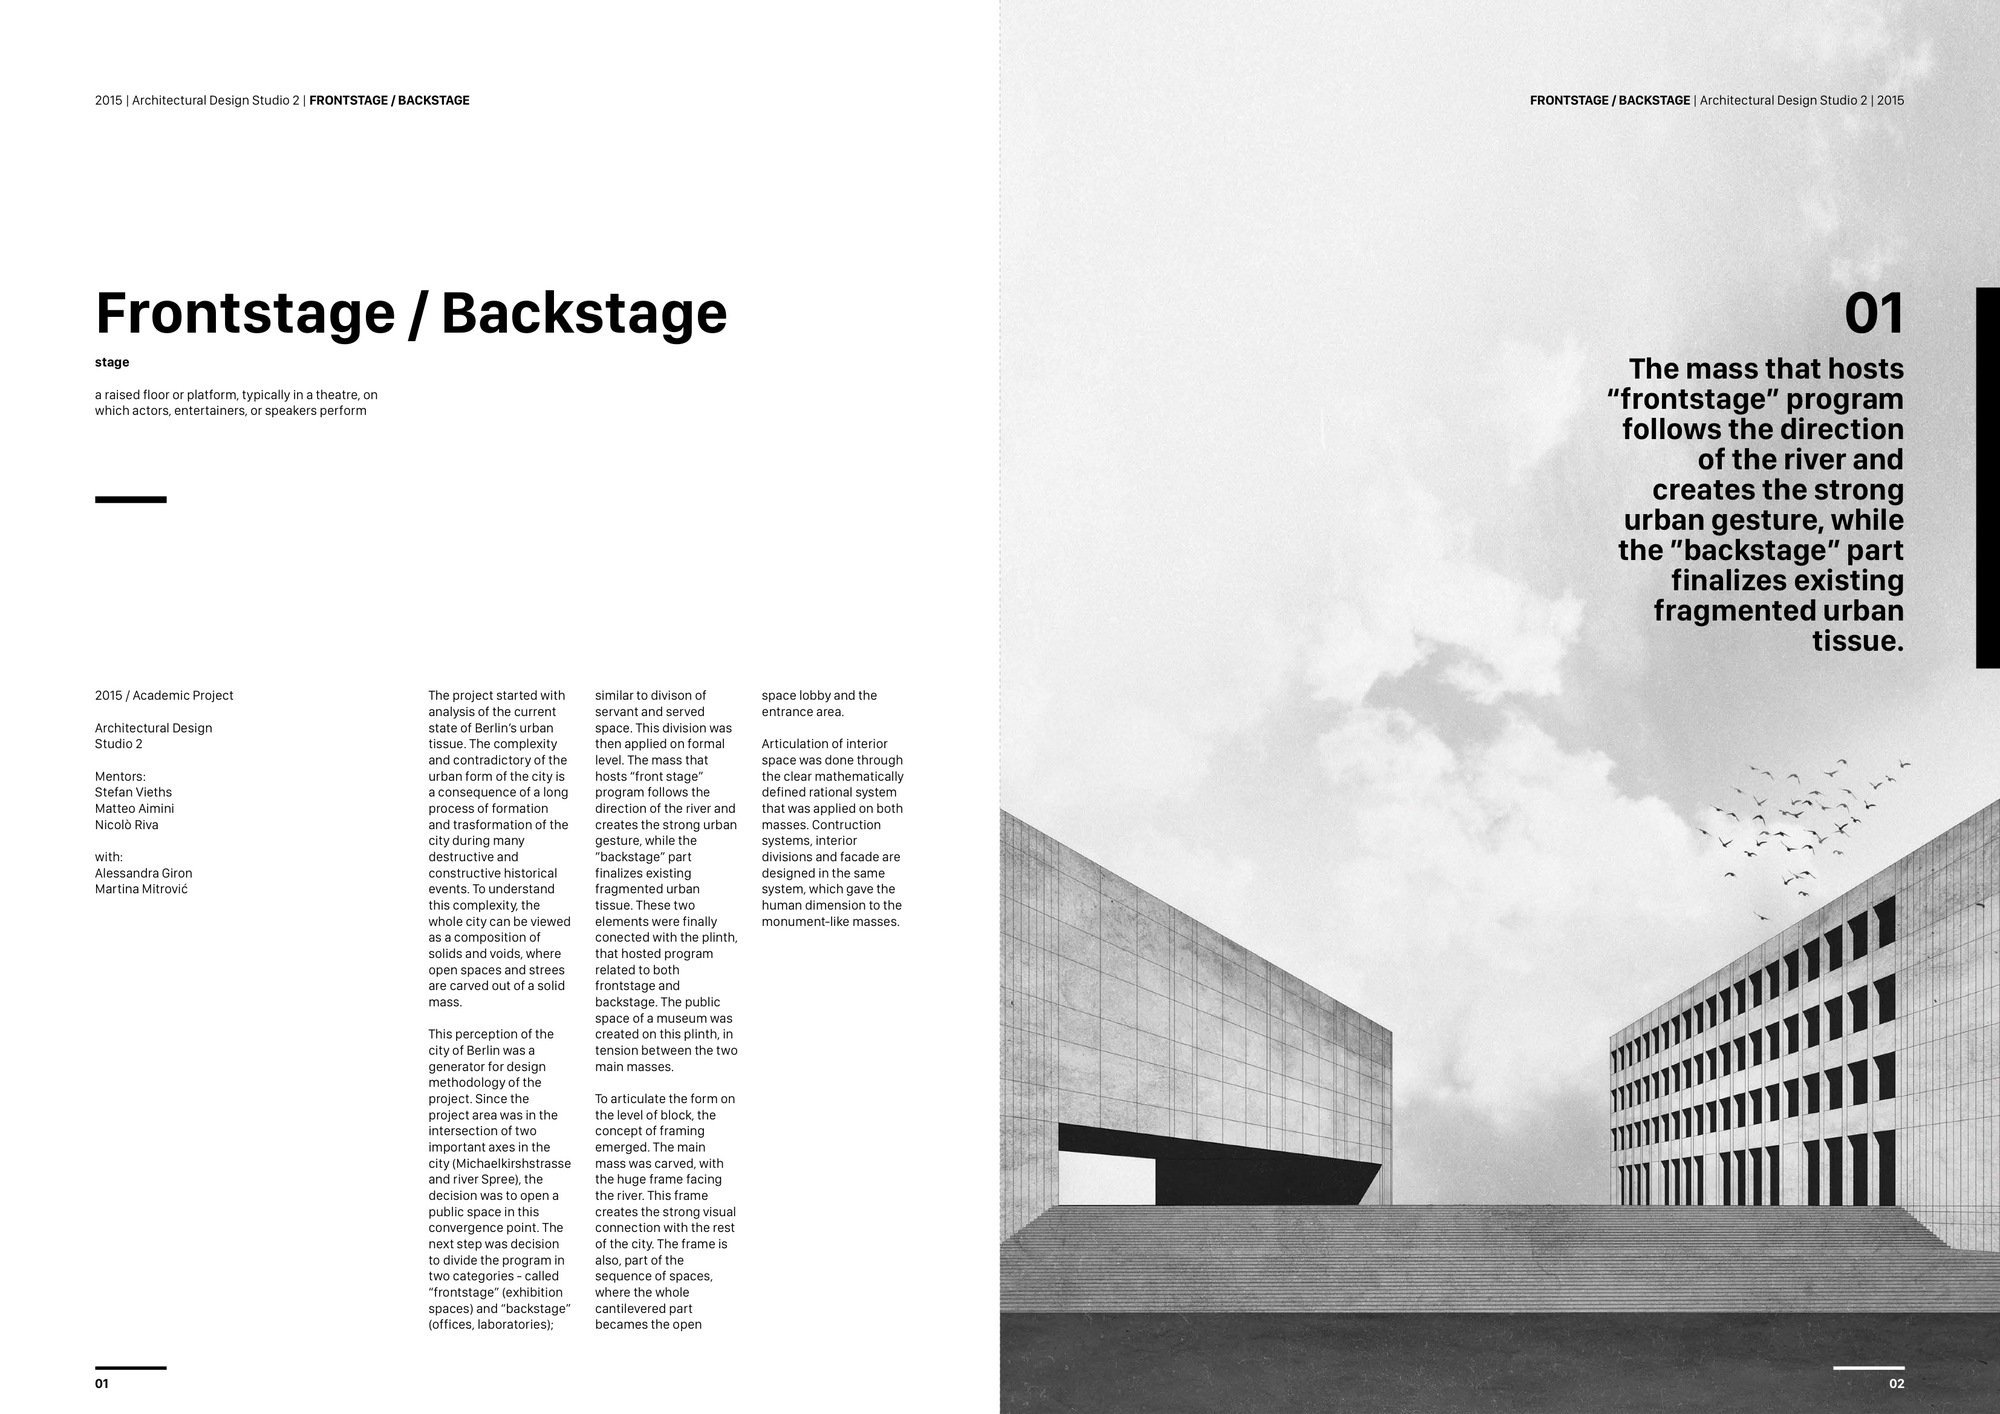 Gallery of the best architecture portfolio designs 37 for Architectural portfolio ideas